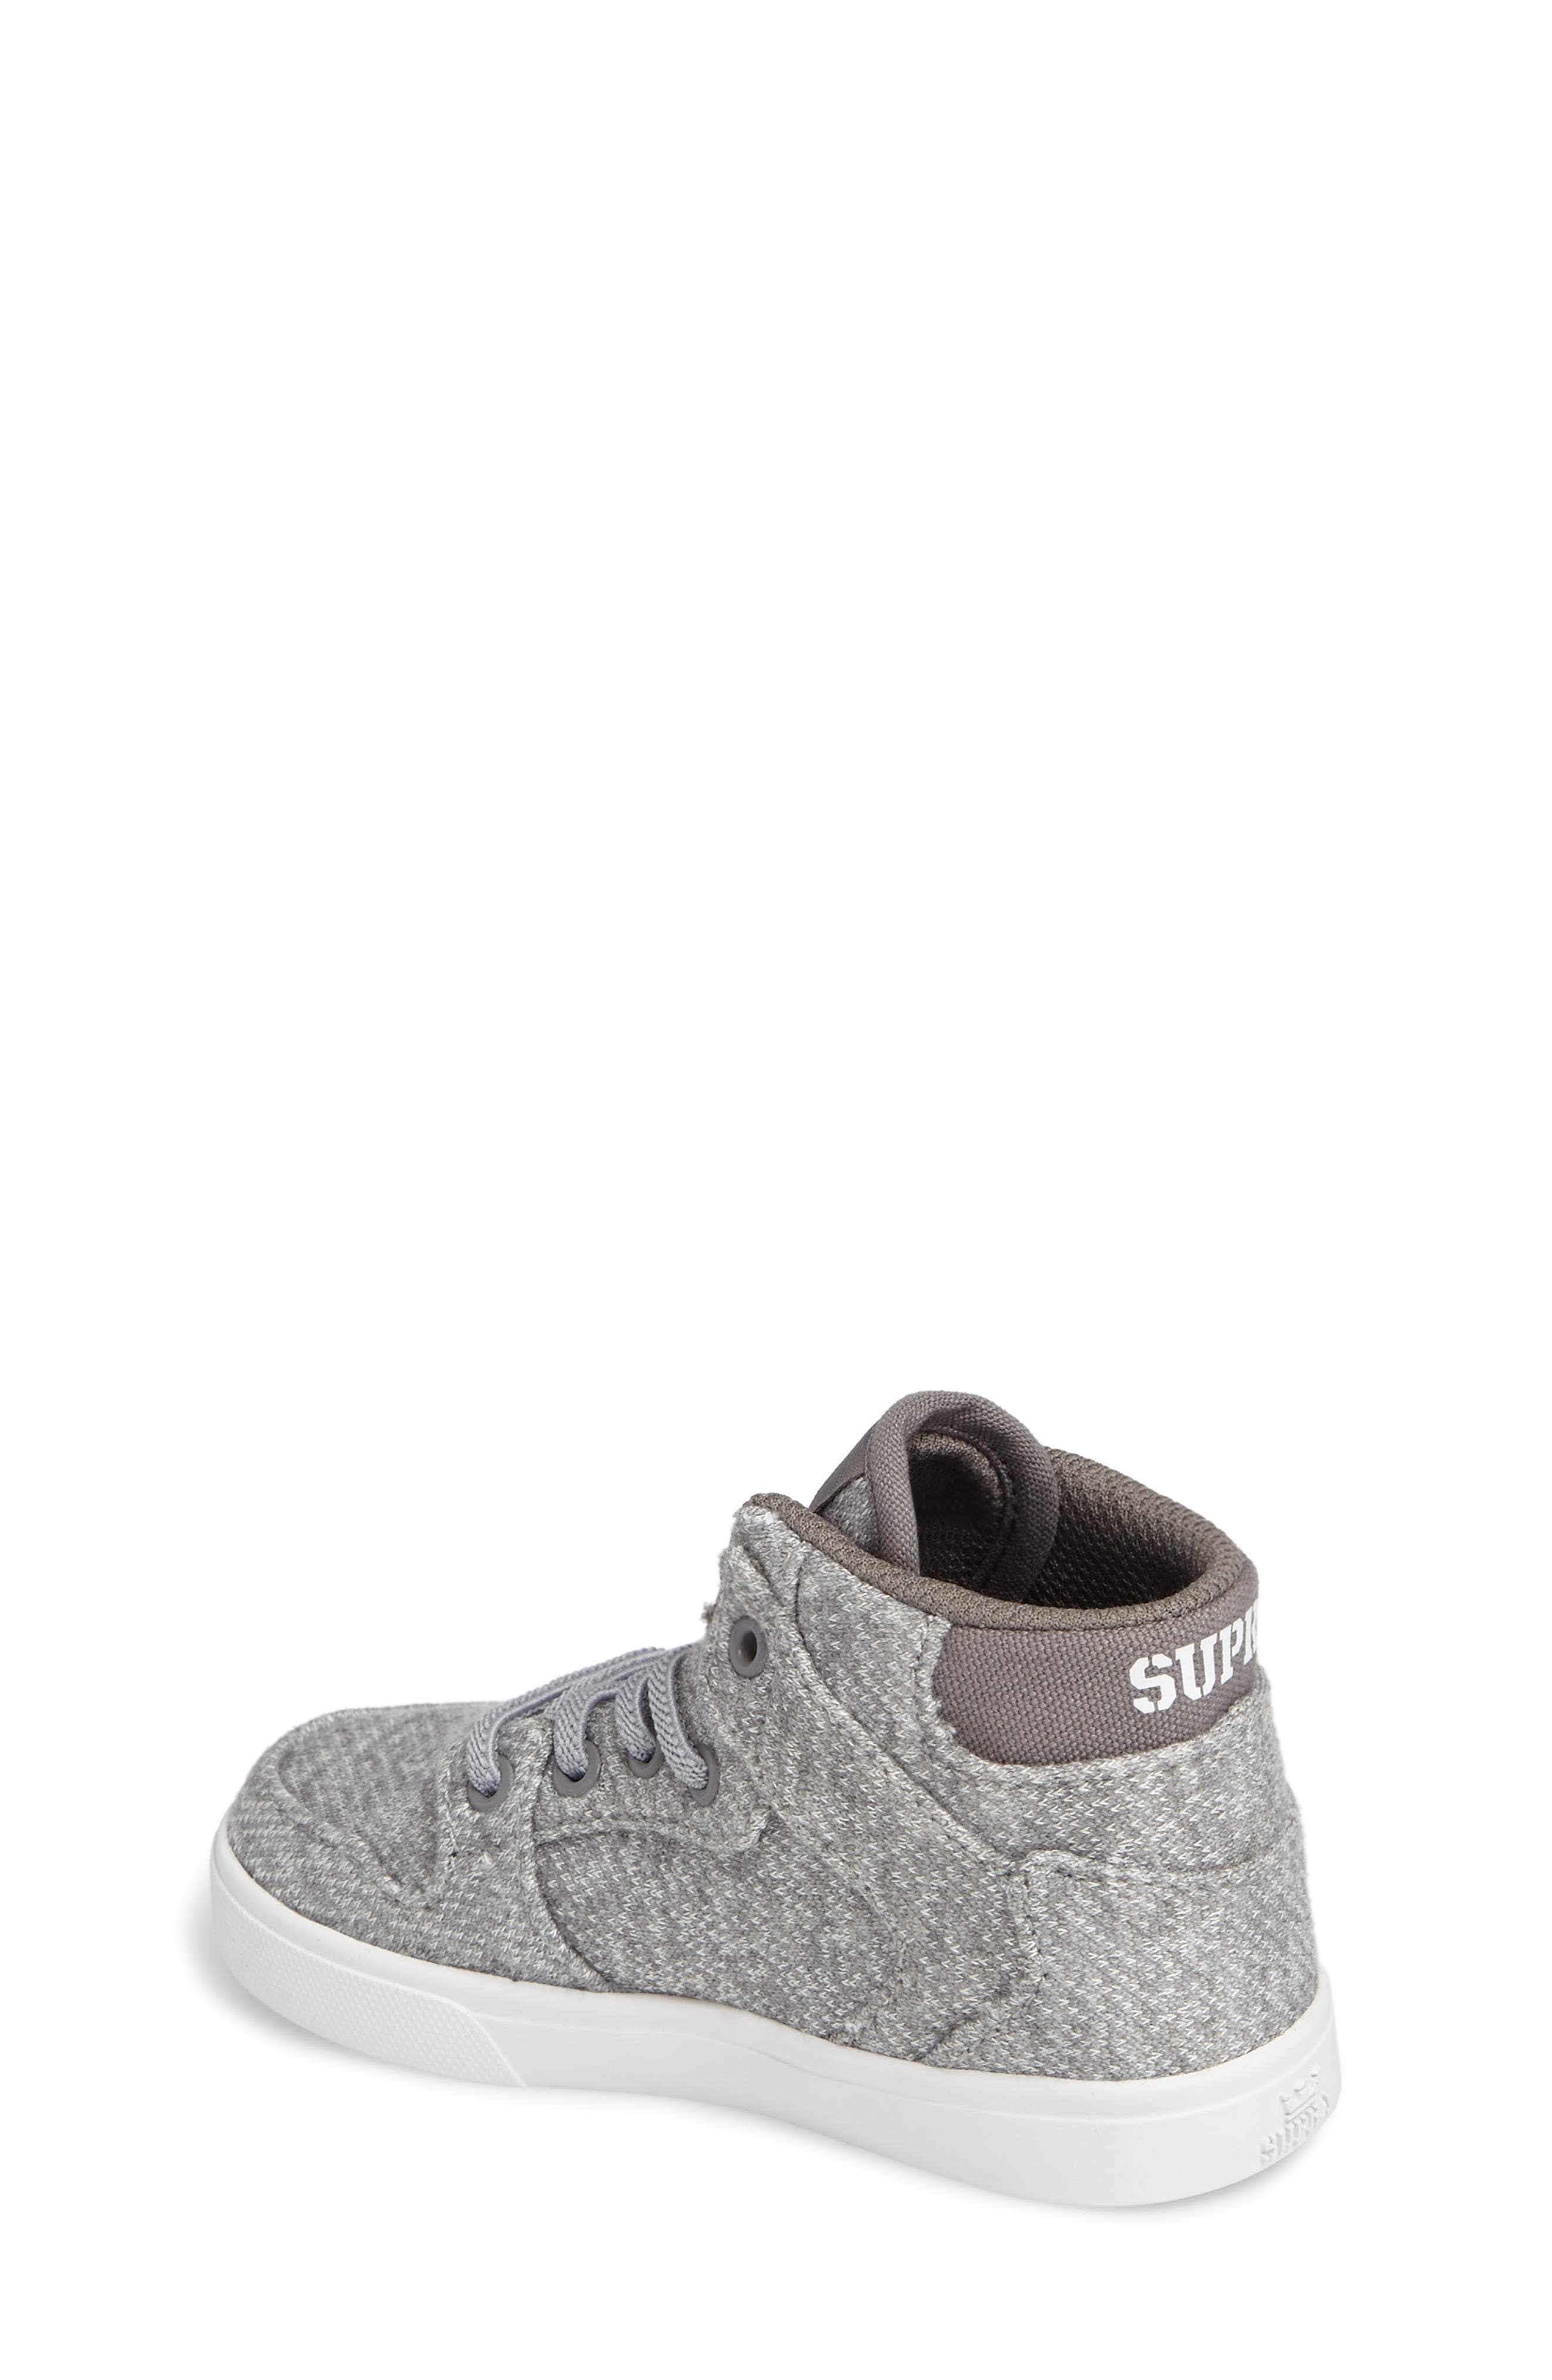 'Vaider' High Top Sneaker,                             Alternate thumbnail 2, color,                             Silver